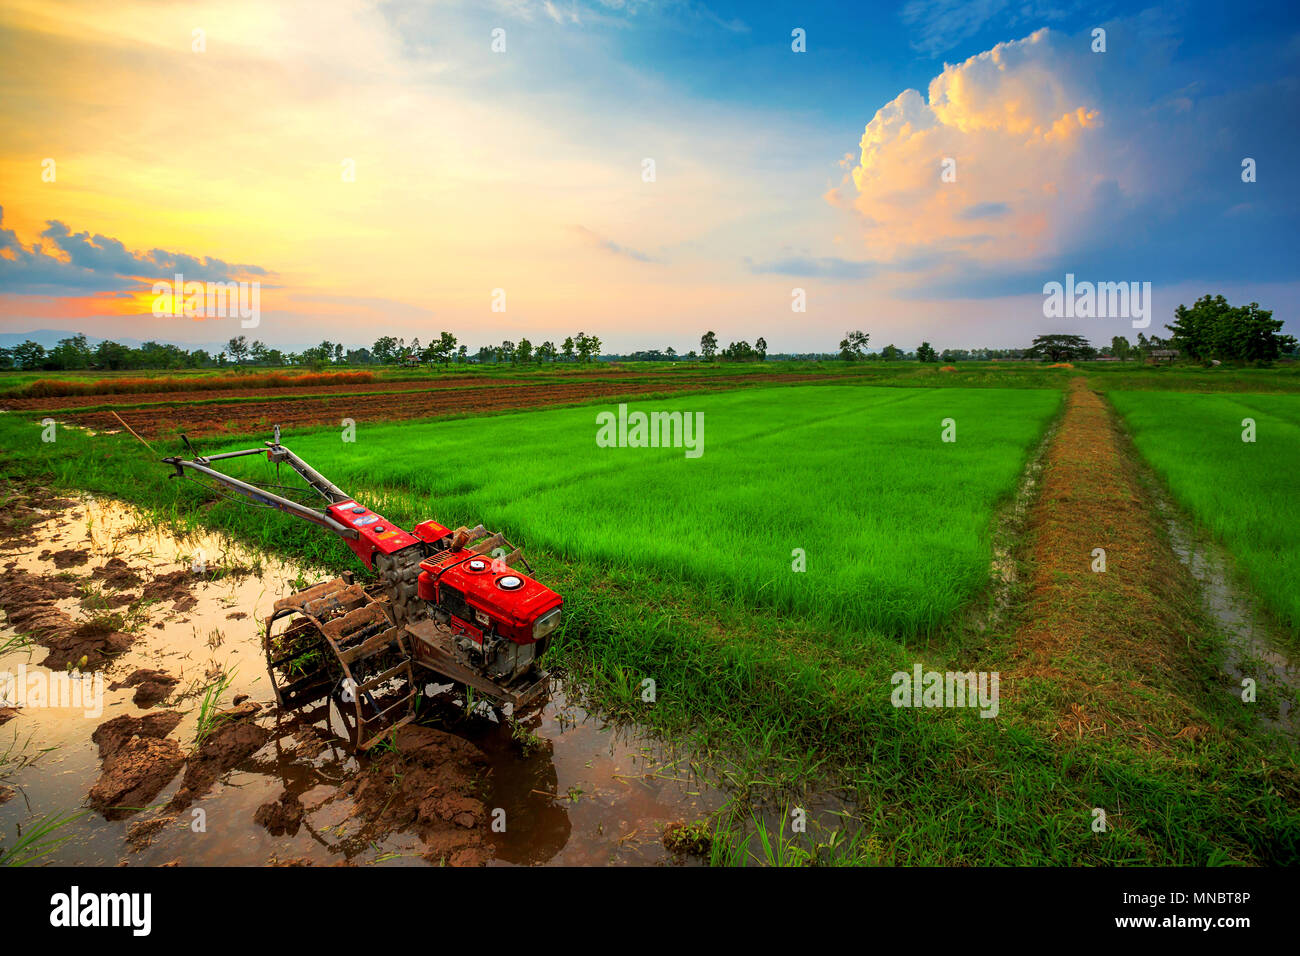 Power Tiller Stock Photos & Power Tiller Stock Images - Alamy